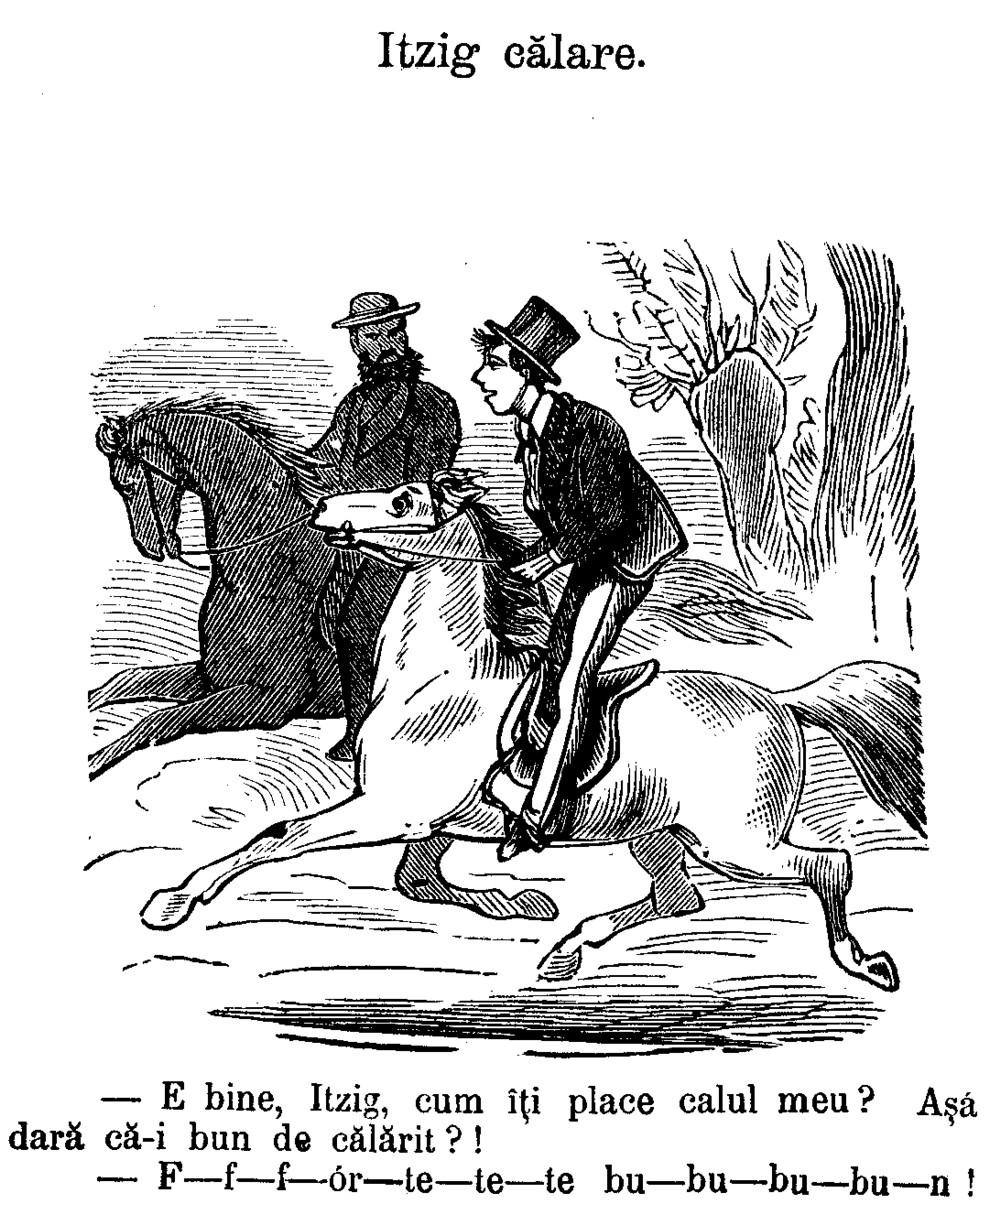 1882 Itzig calare